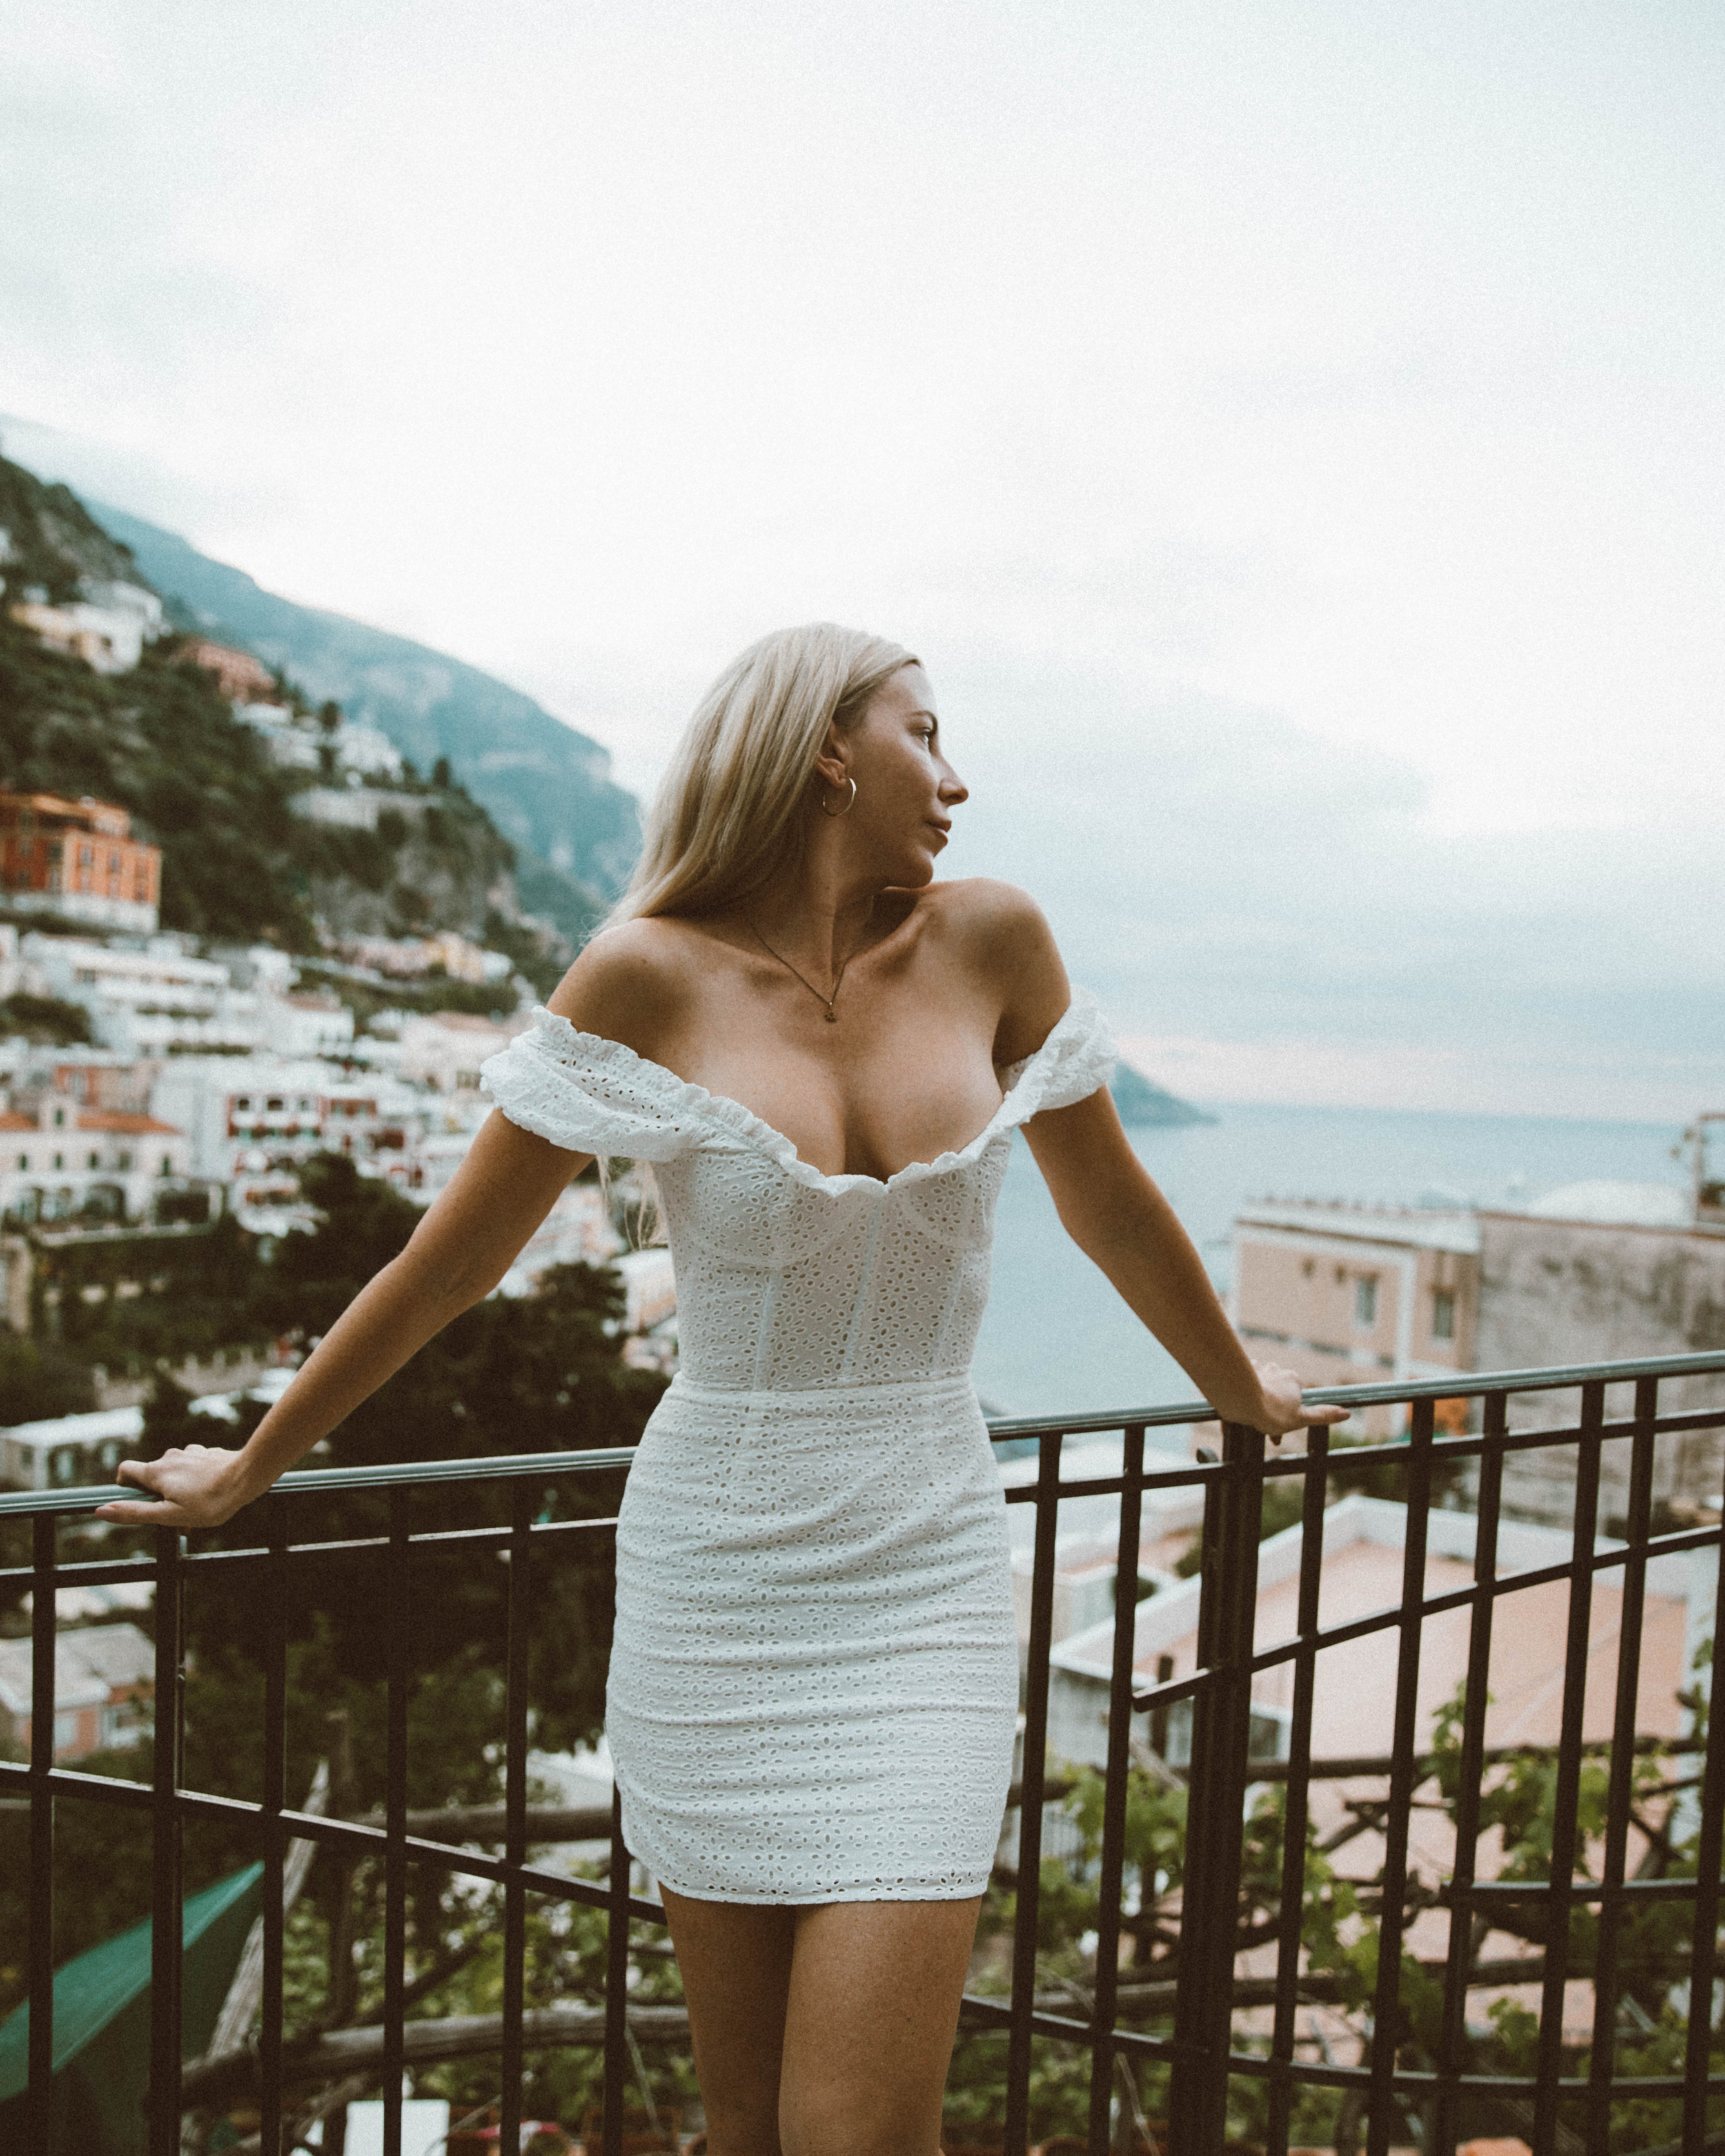 Sabo white dress perm 4 (1 of 1).jpg